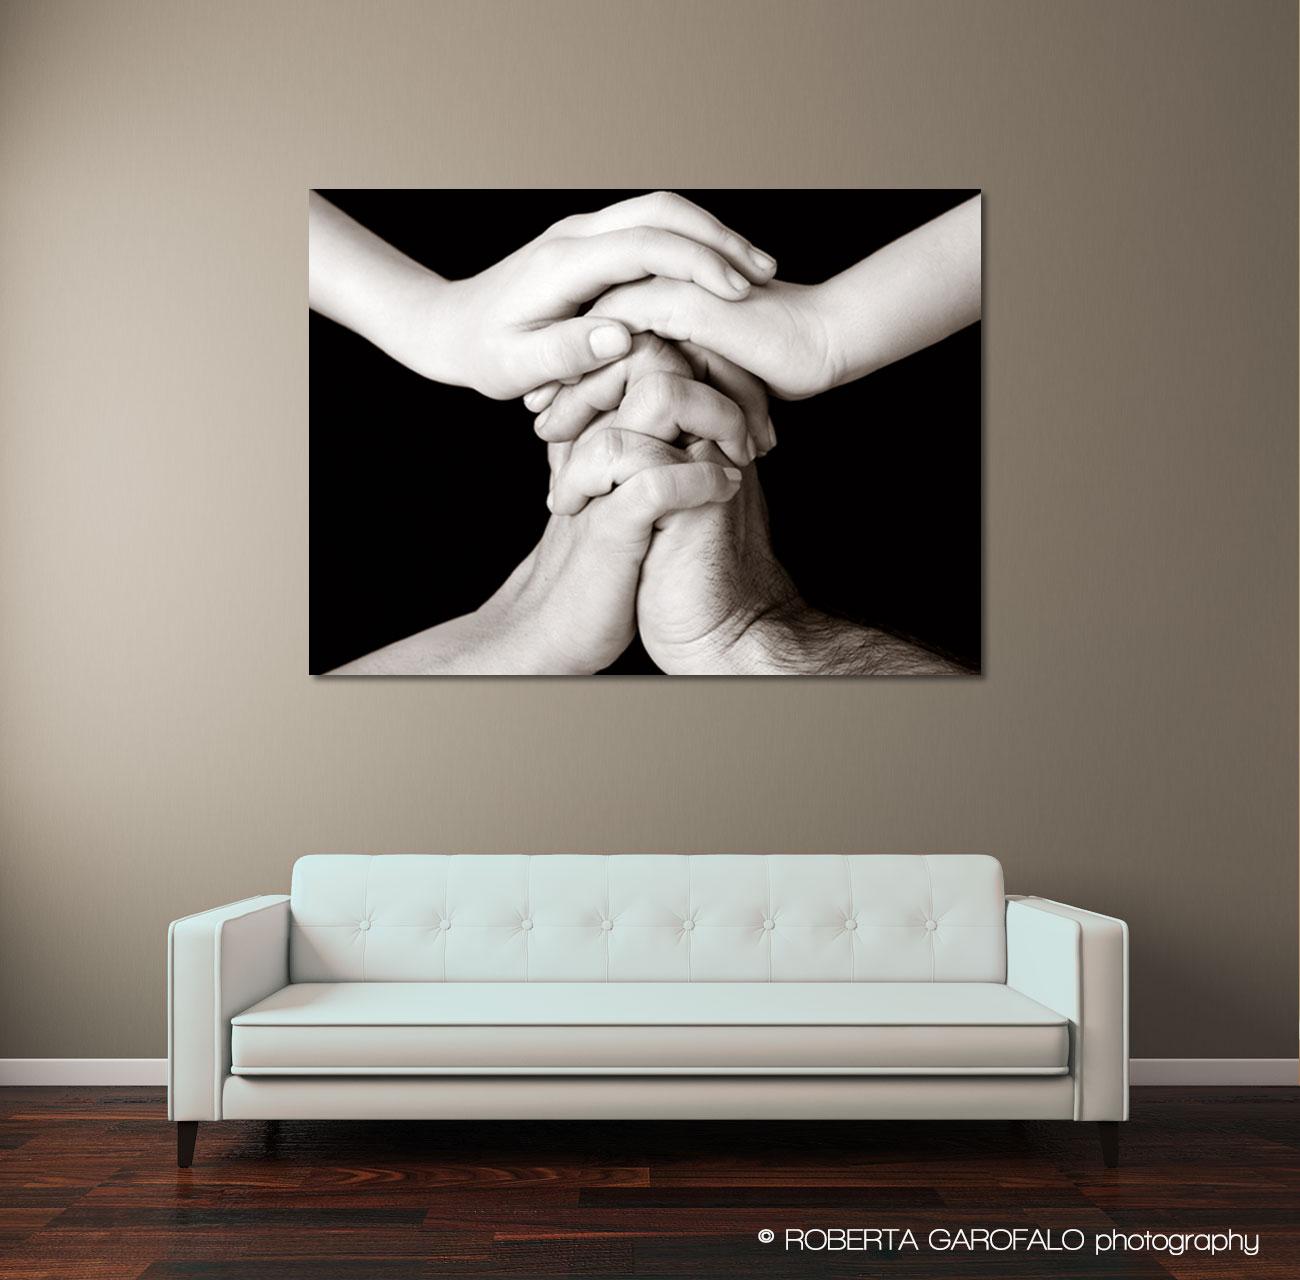 Roberta_Garofalo_Fine-Art- Images